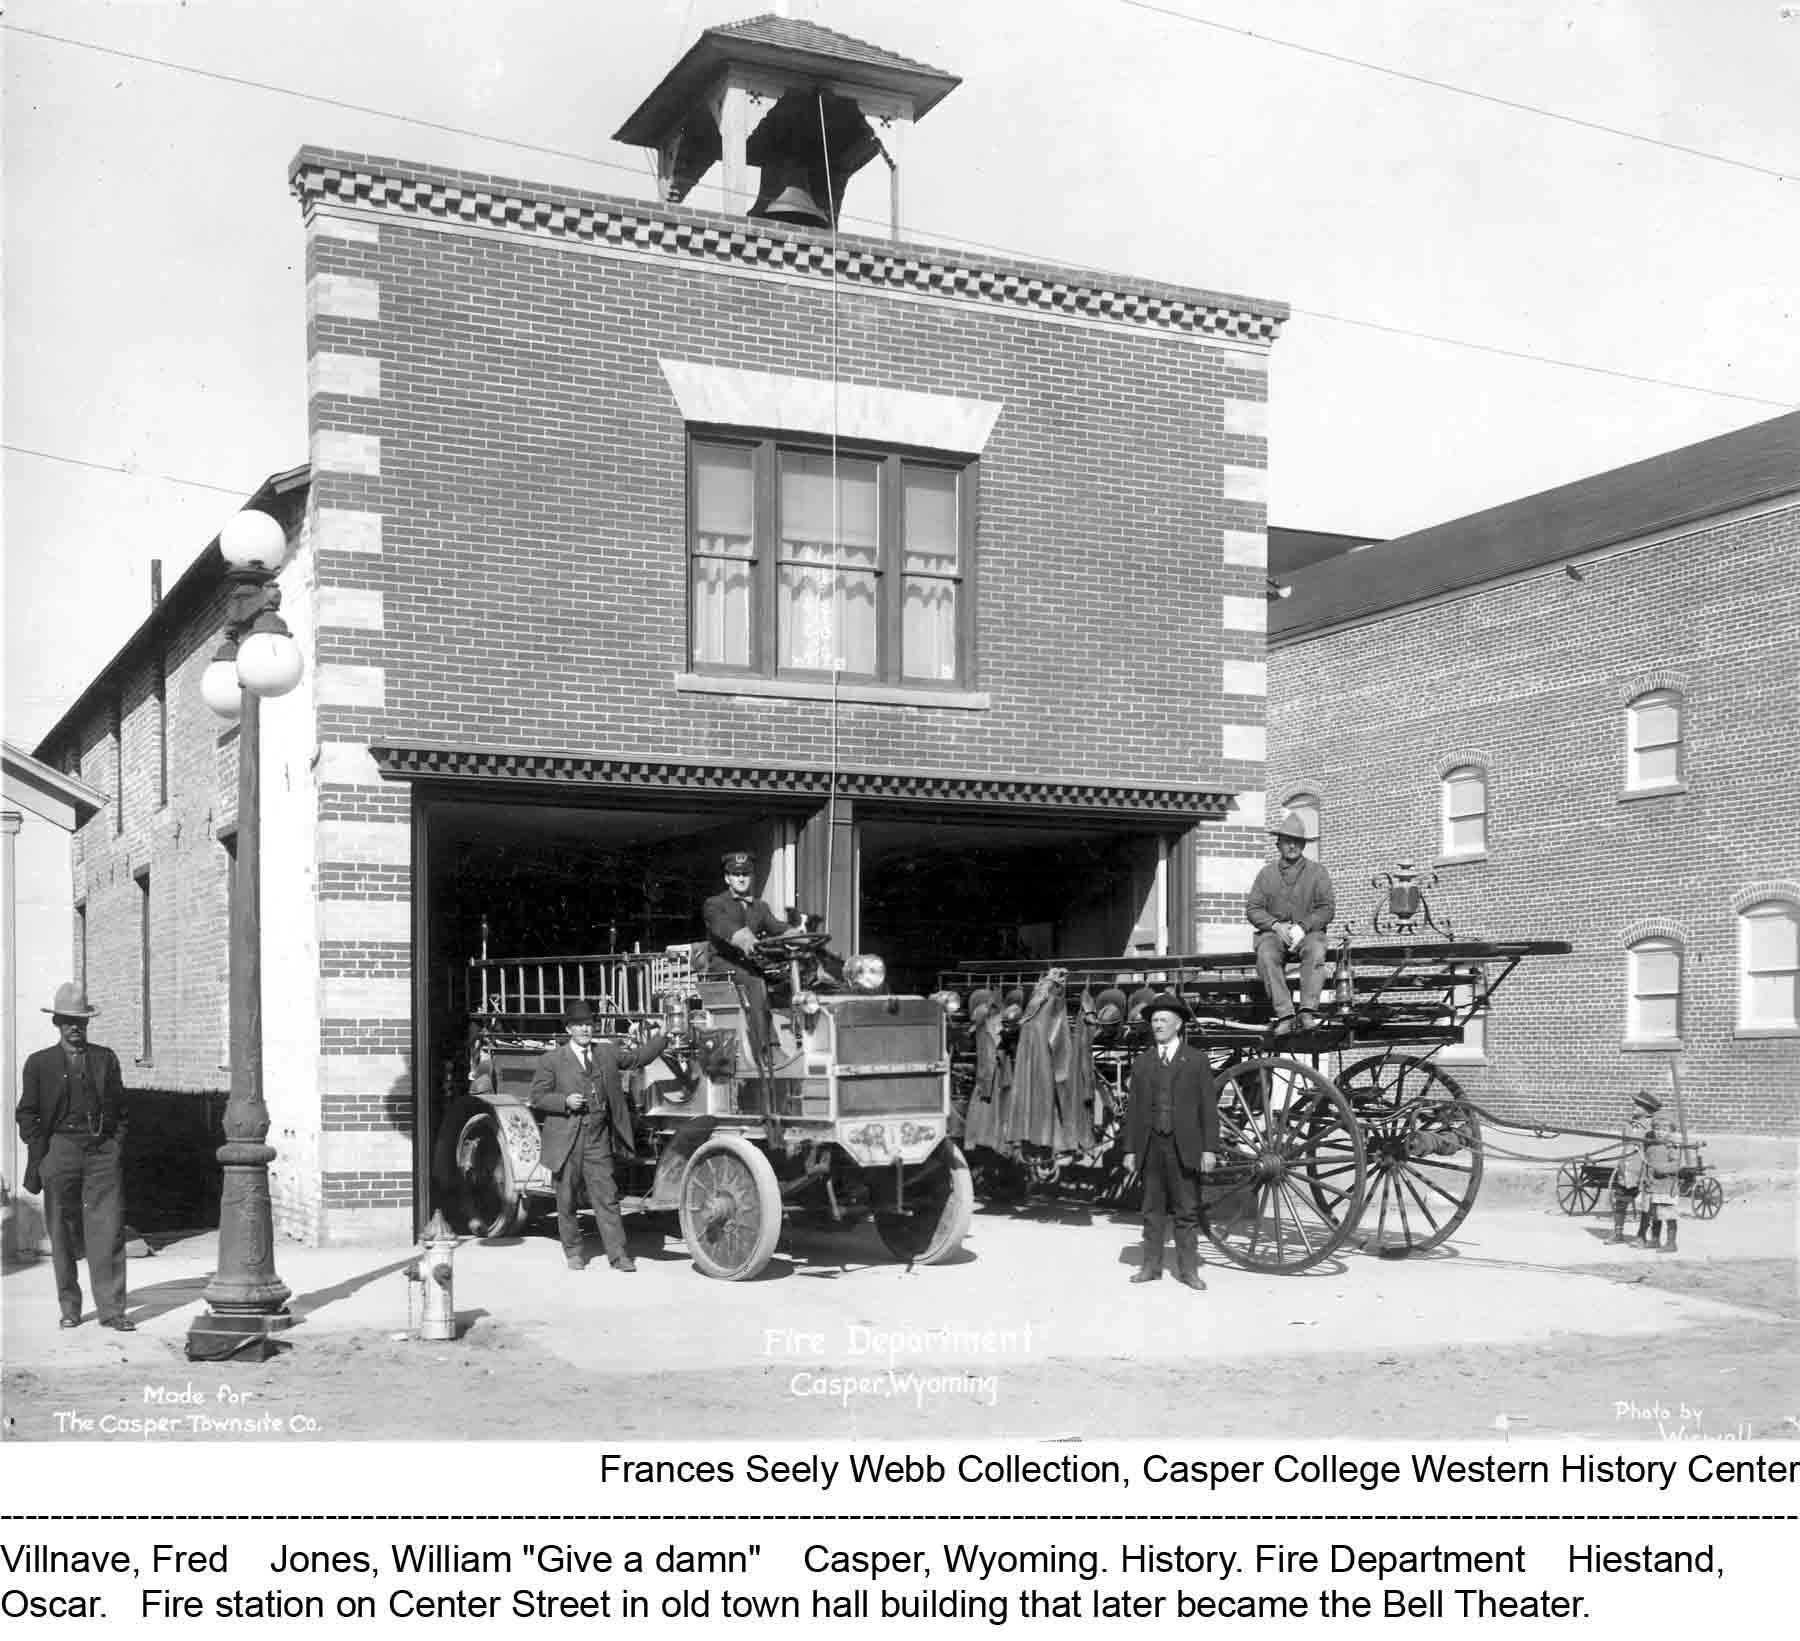 History | Downtown Development Authority of Casper, Wyoming